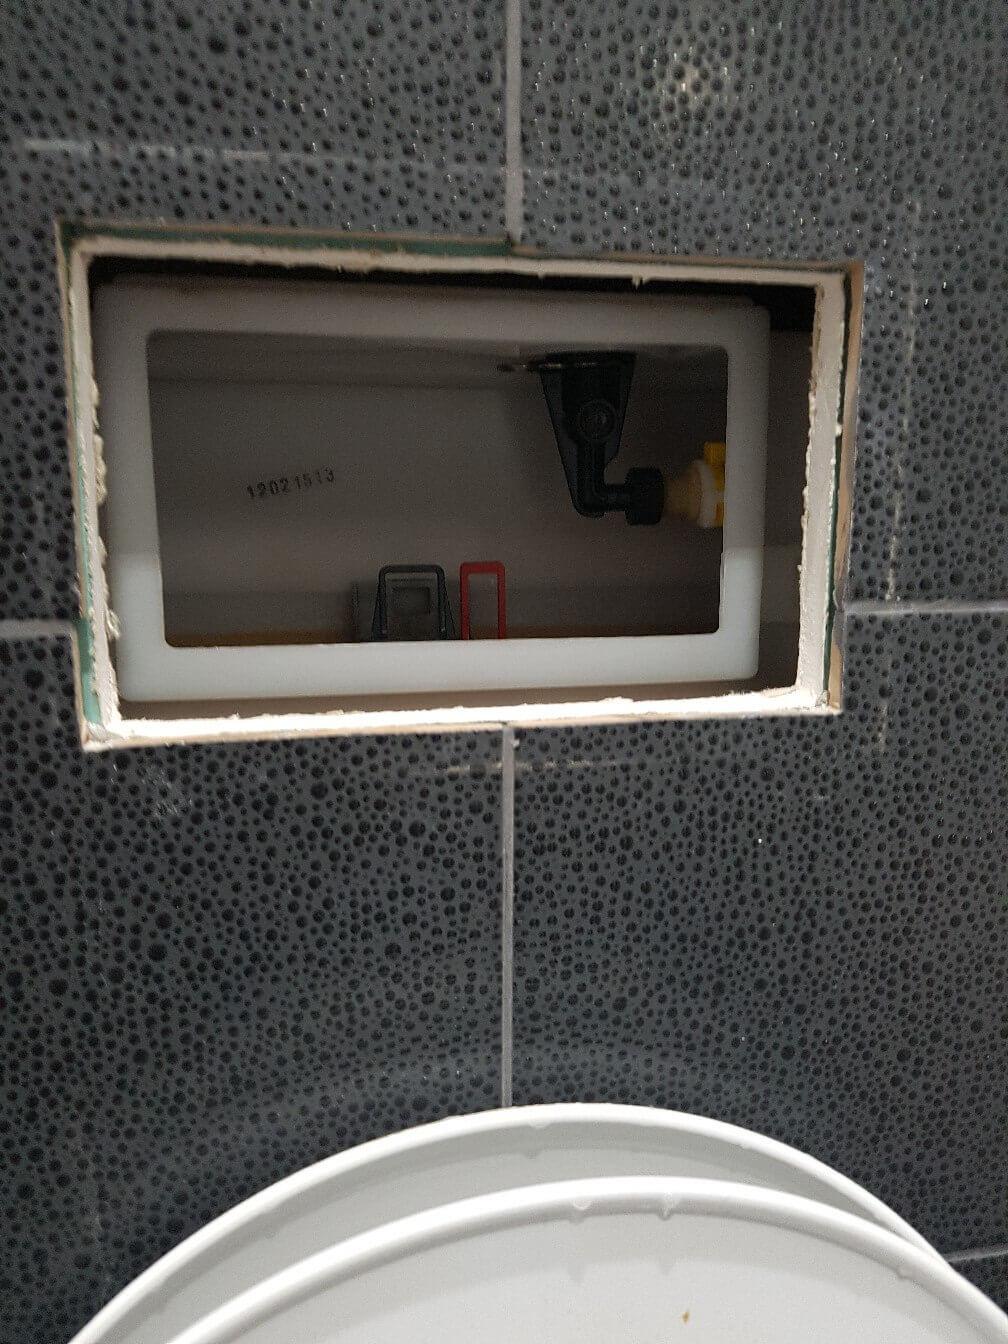 20180404-remont-installacii-tece-4.jpg